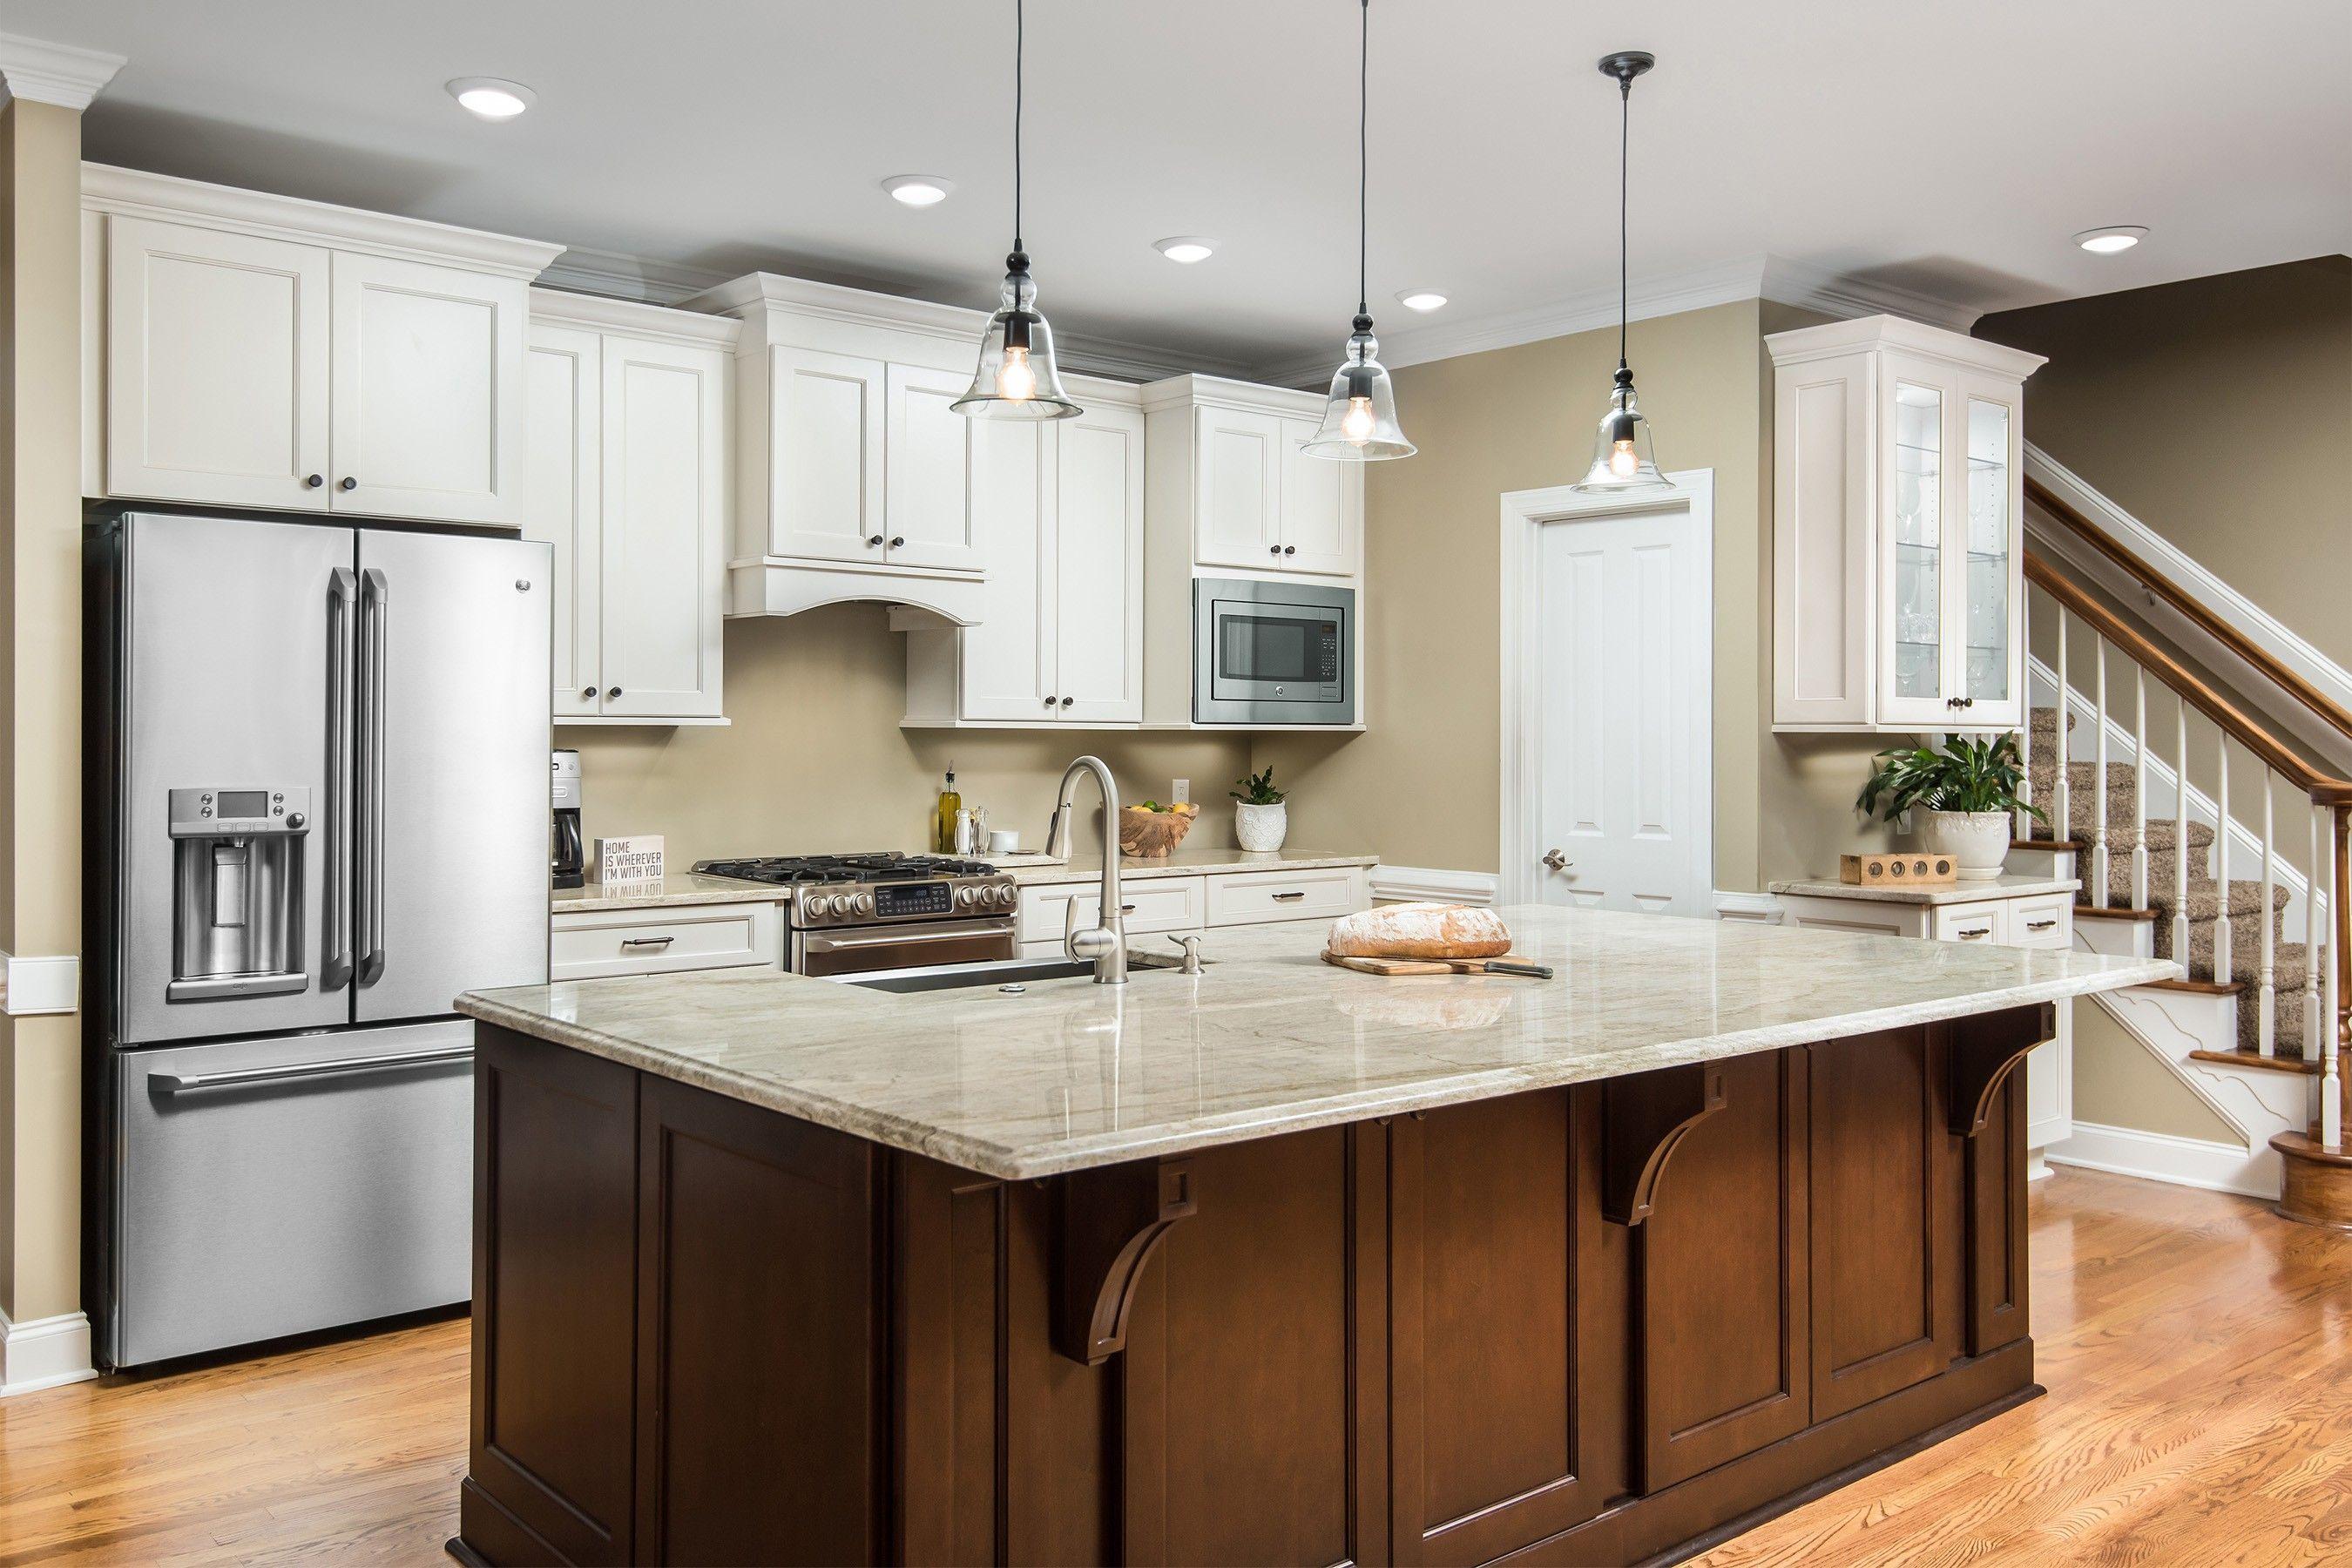 Best Impressive One Wall Kitchen Ideas With Island A Kitchen 400 x 300